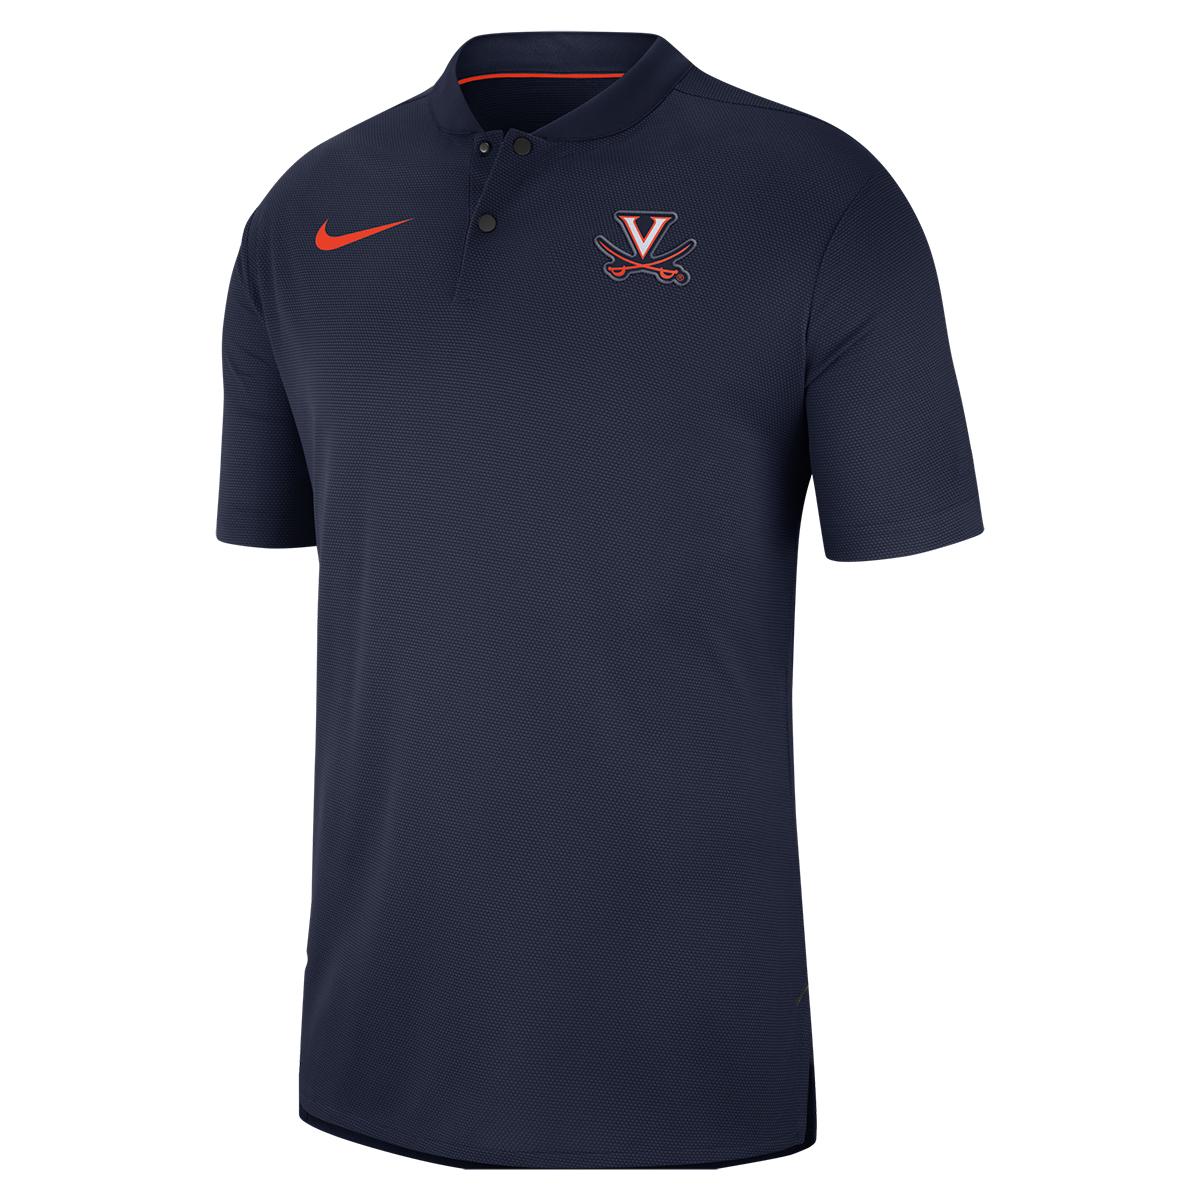 University of Virginia Nike Dri-FIT Polo Shirt